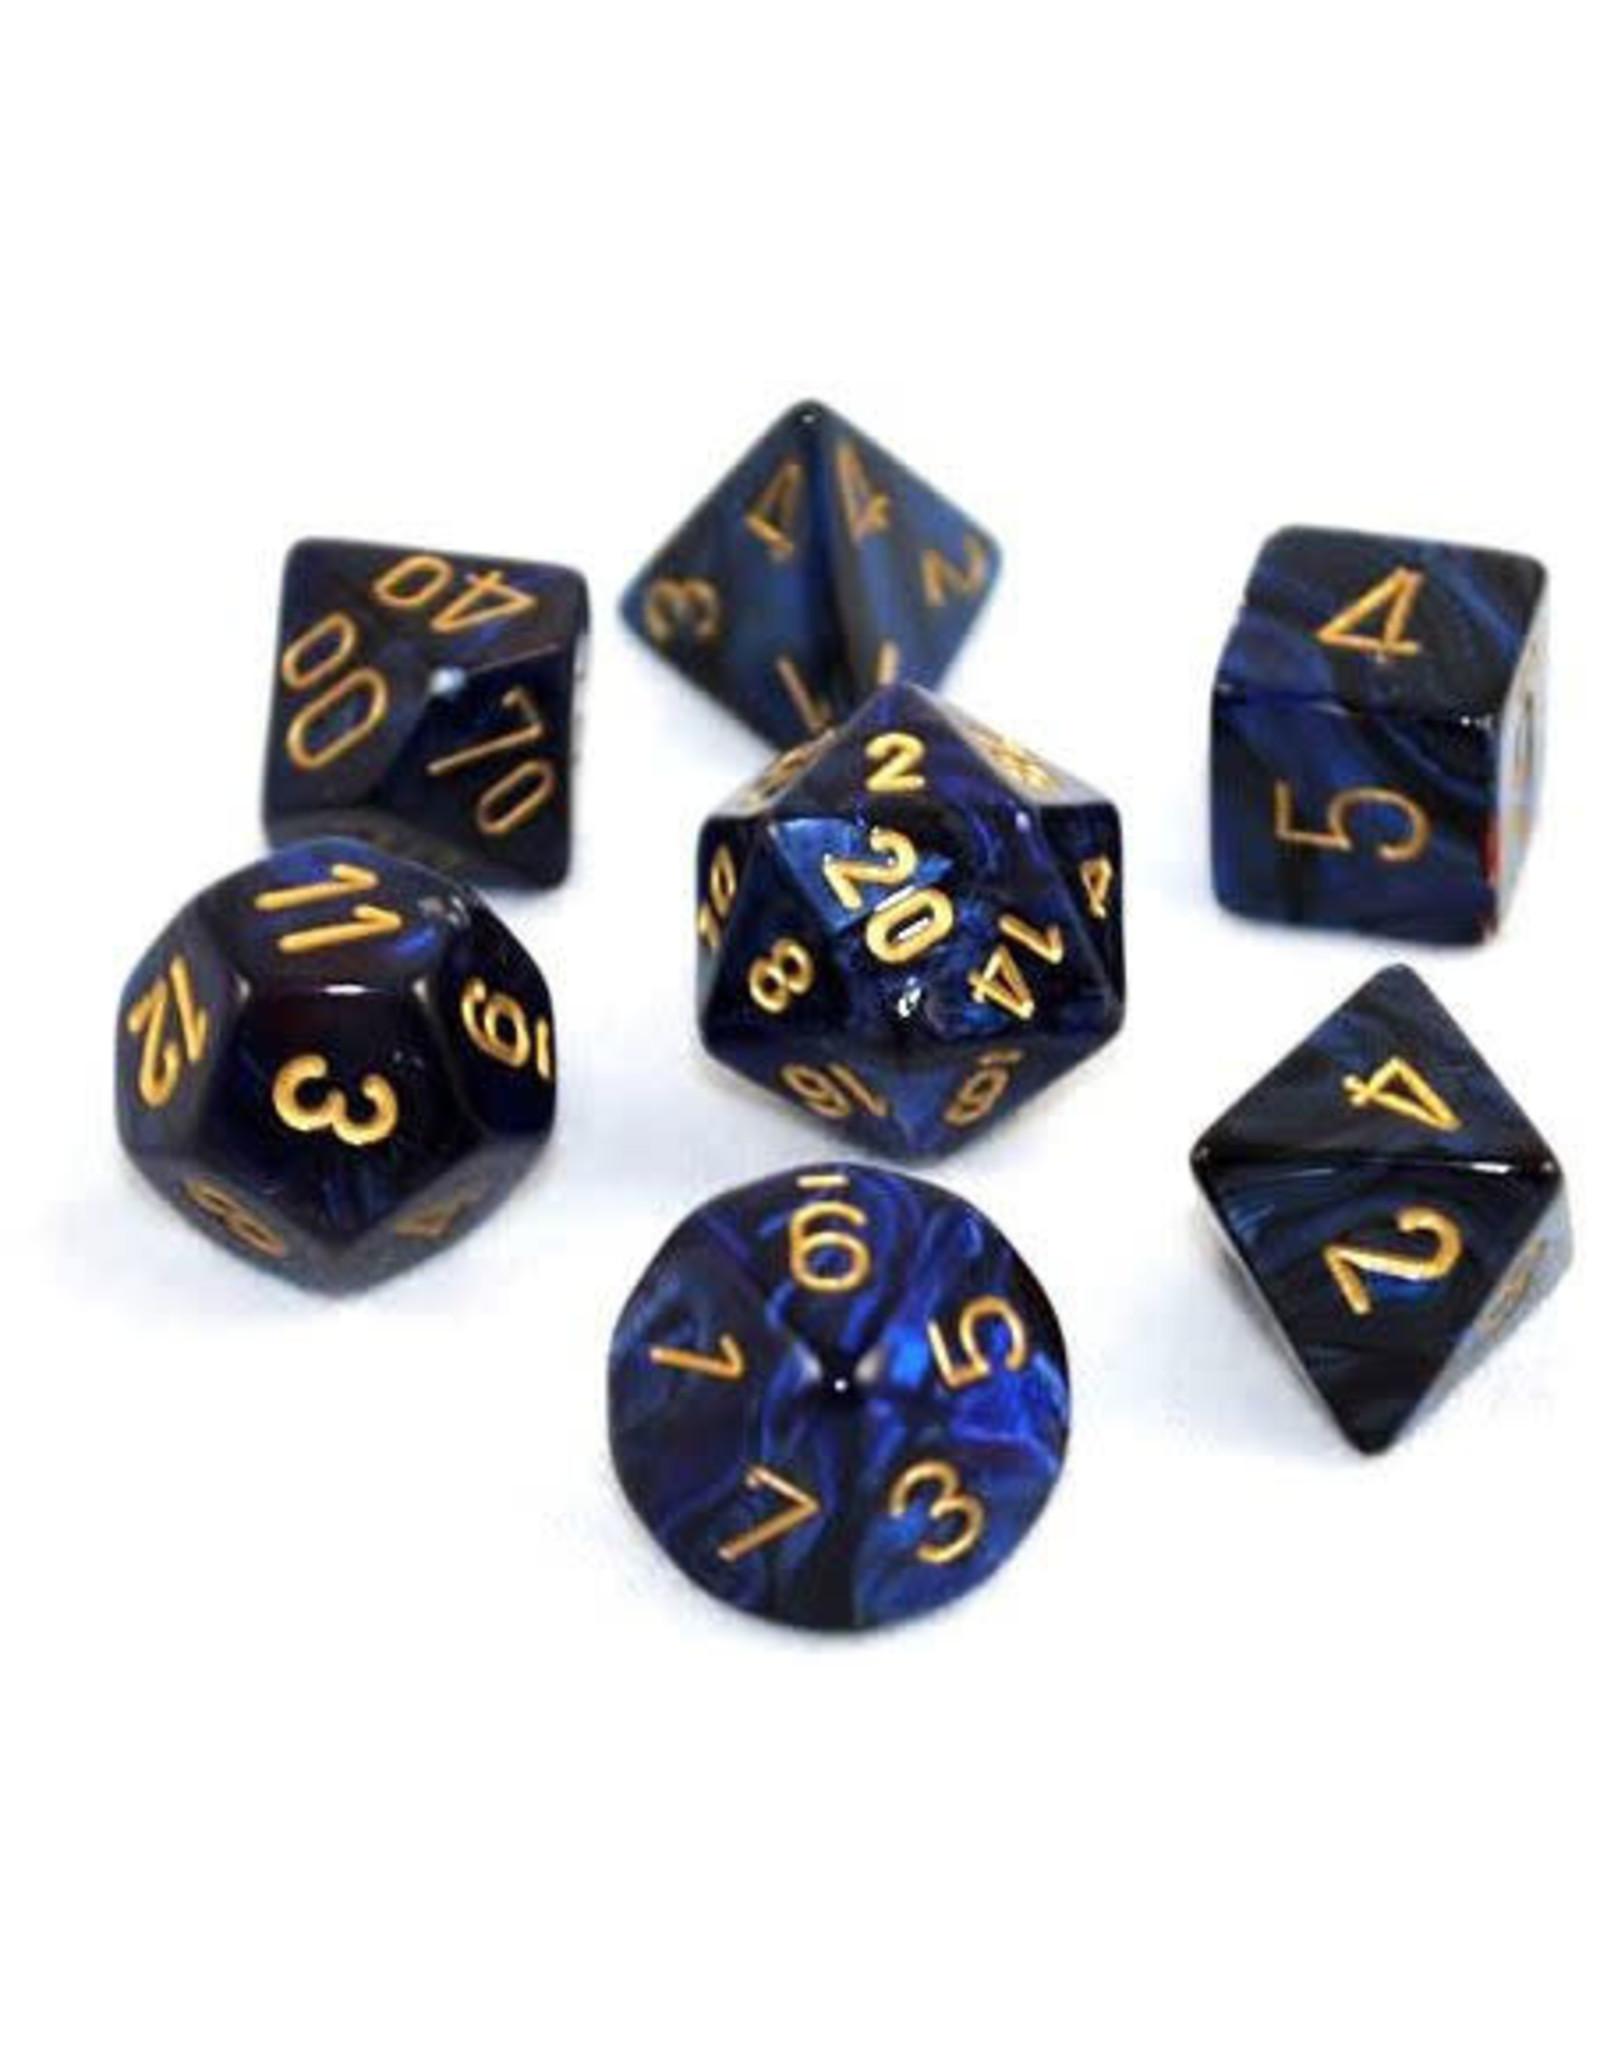 Chessex Dice: 7-Set Cube Gemini #3 Black, Blue w/gold (Chessex)